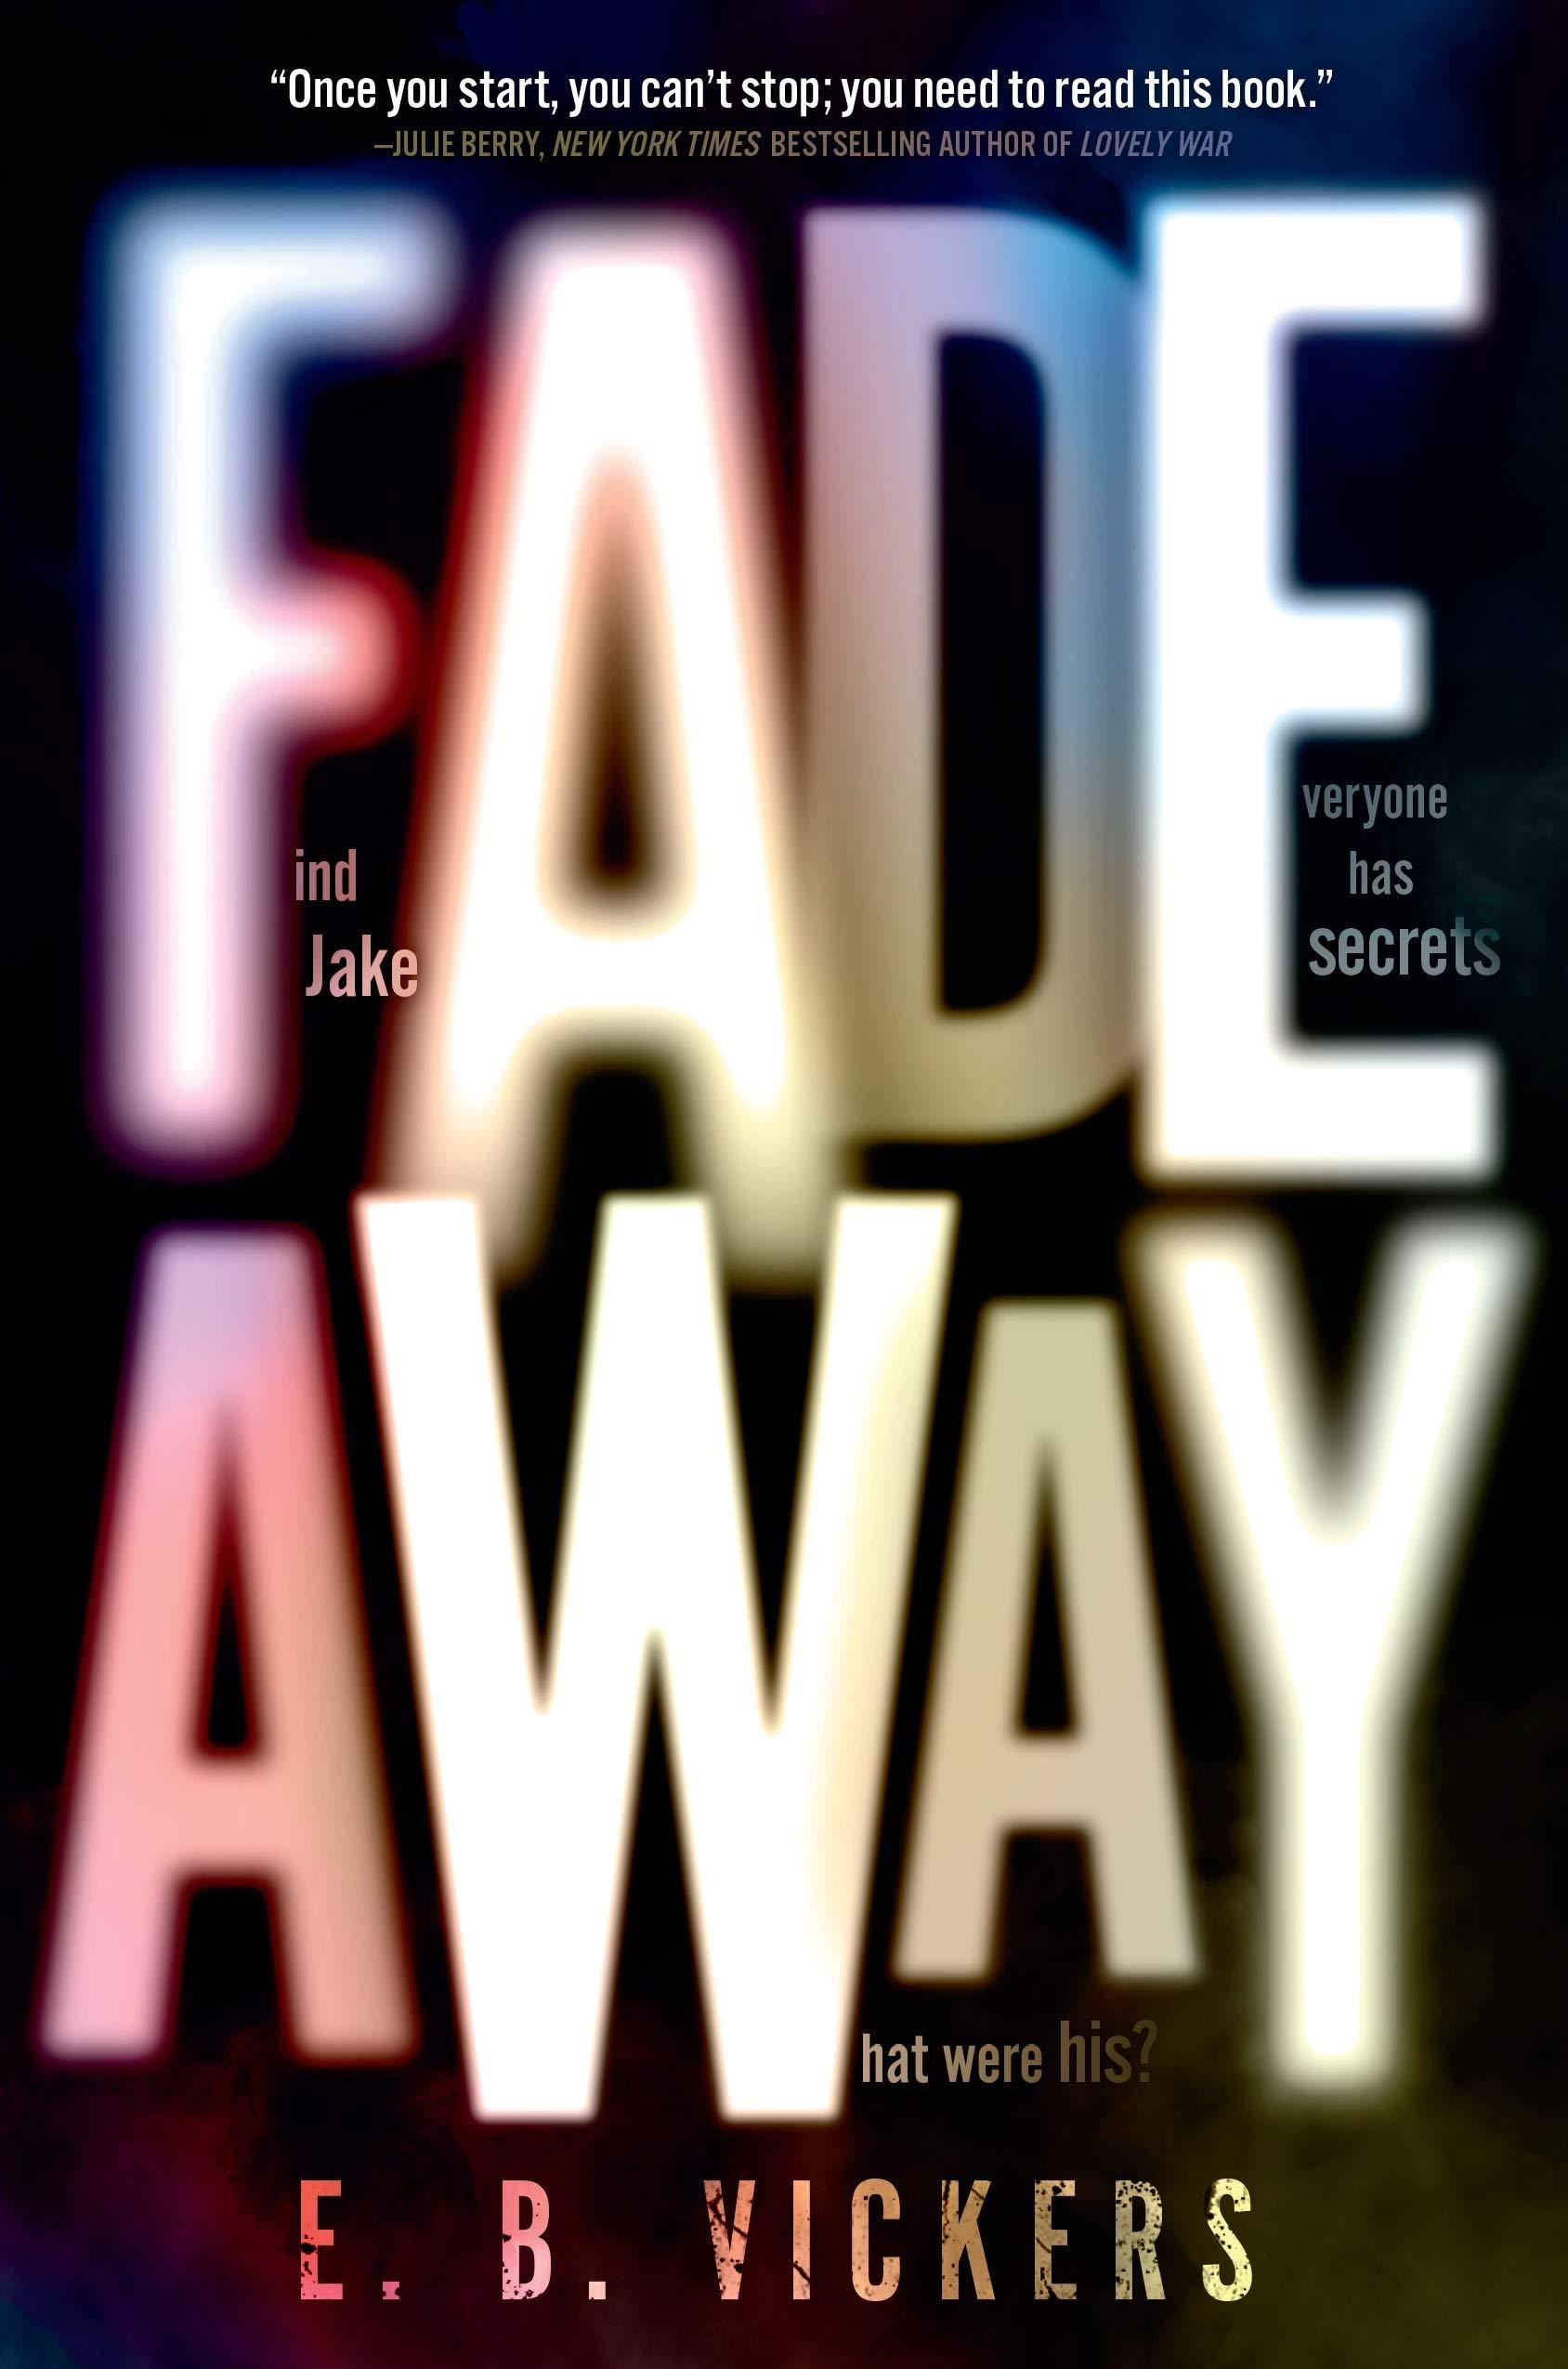 Amazon.com: Fadeaway (9780593180198): Vickers, E. B.: Books